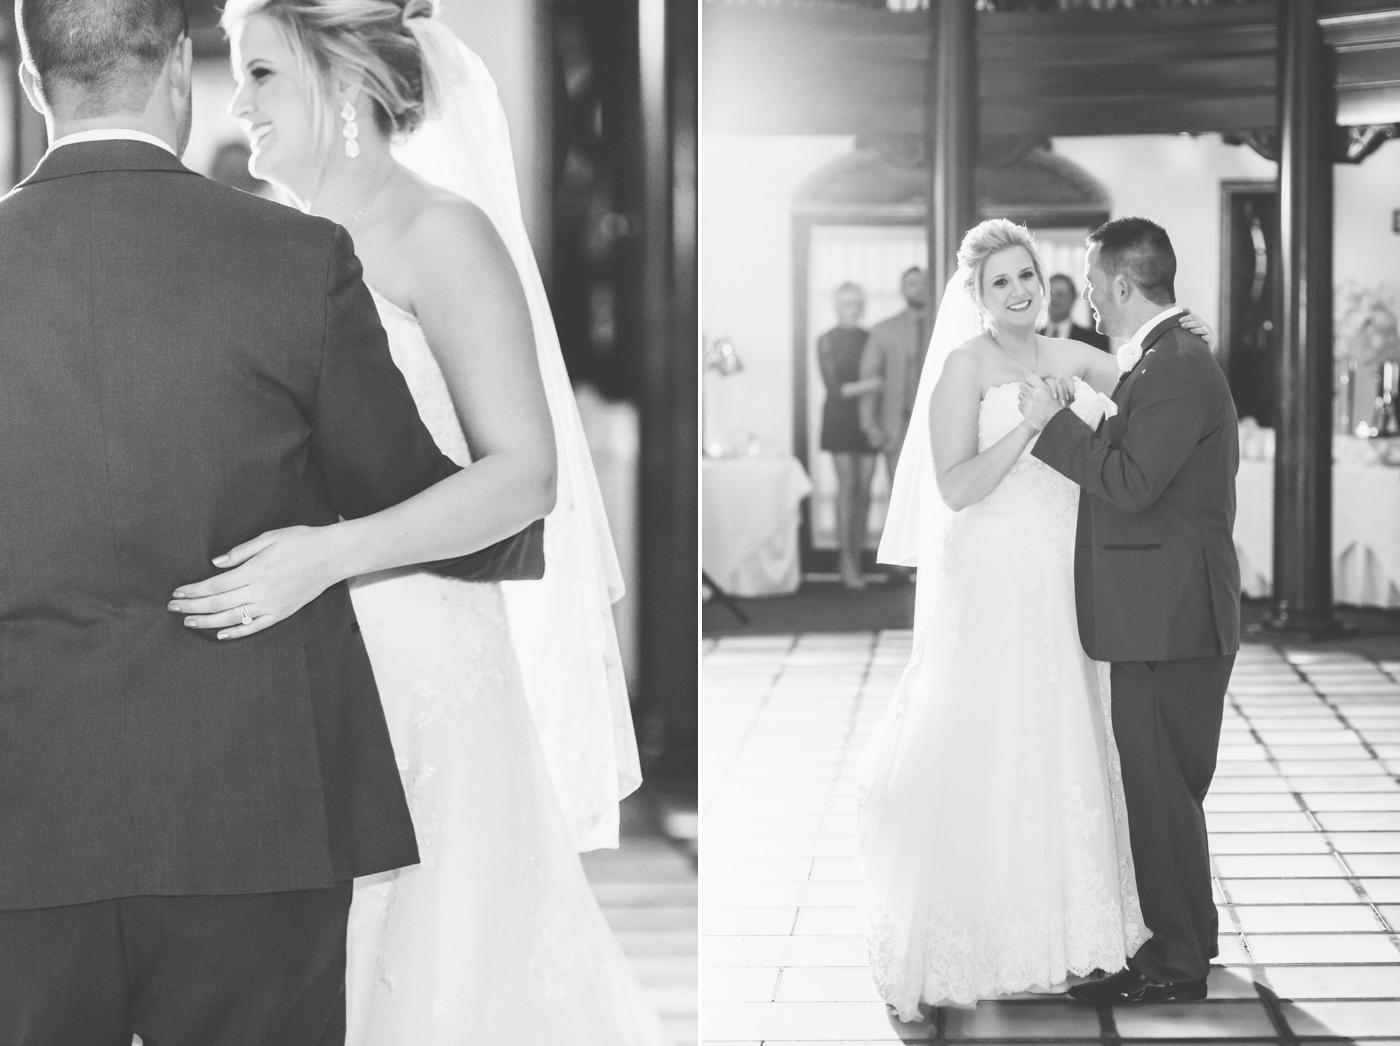 chicago-fine-art-wedding-photography-cassady21